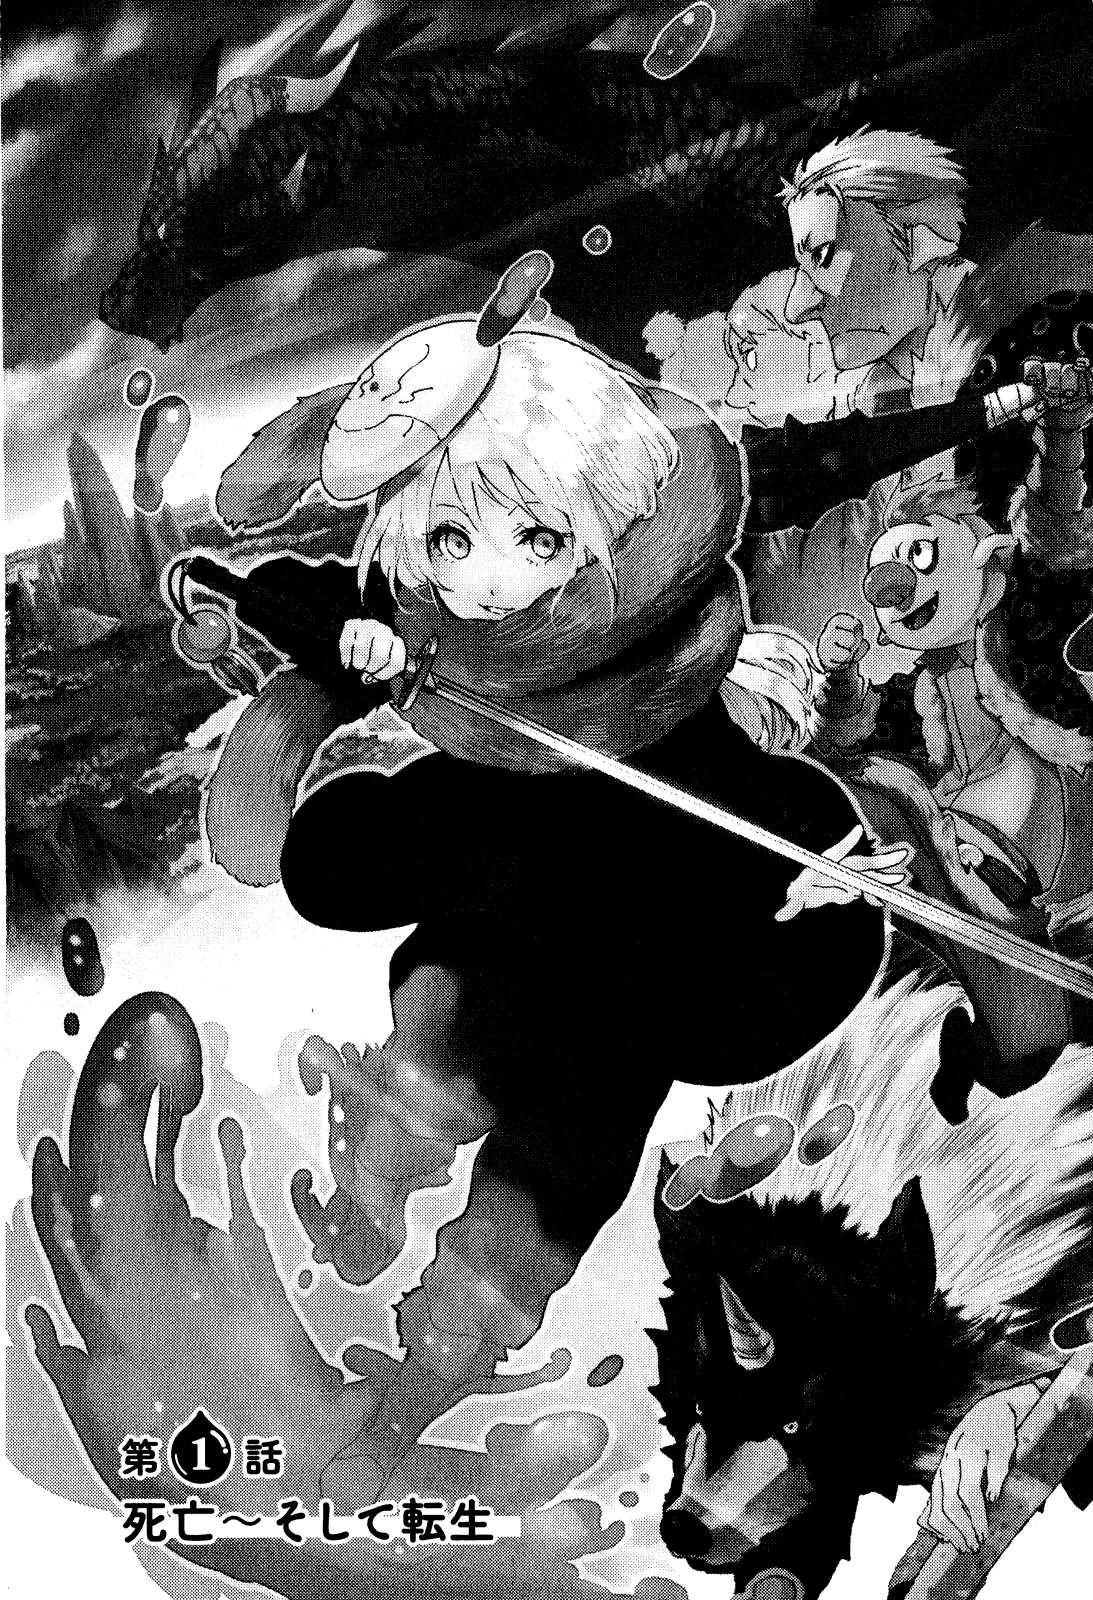 Tensei Shitara Slime Datta Ken Mobile Wallpaper 1999443 Zerochan